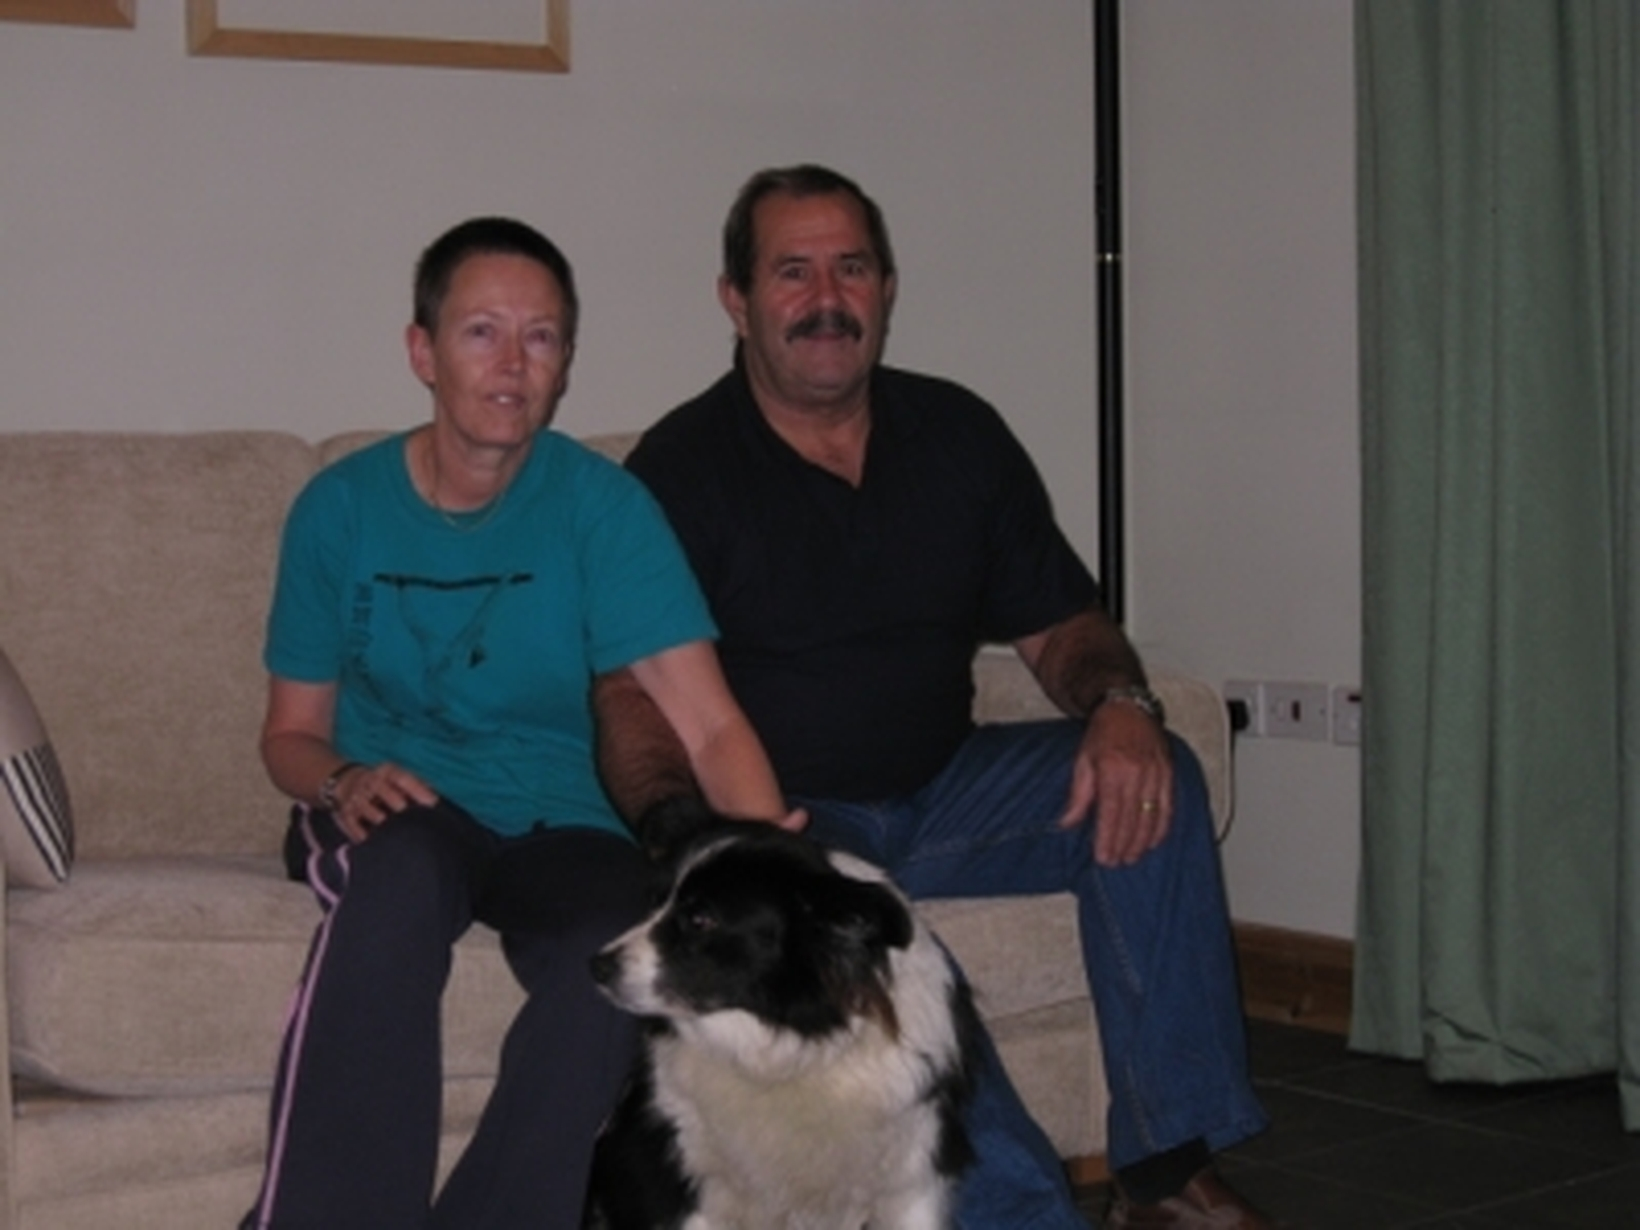 Val & Roy from Perth, Western Australia, Australia